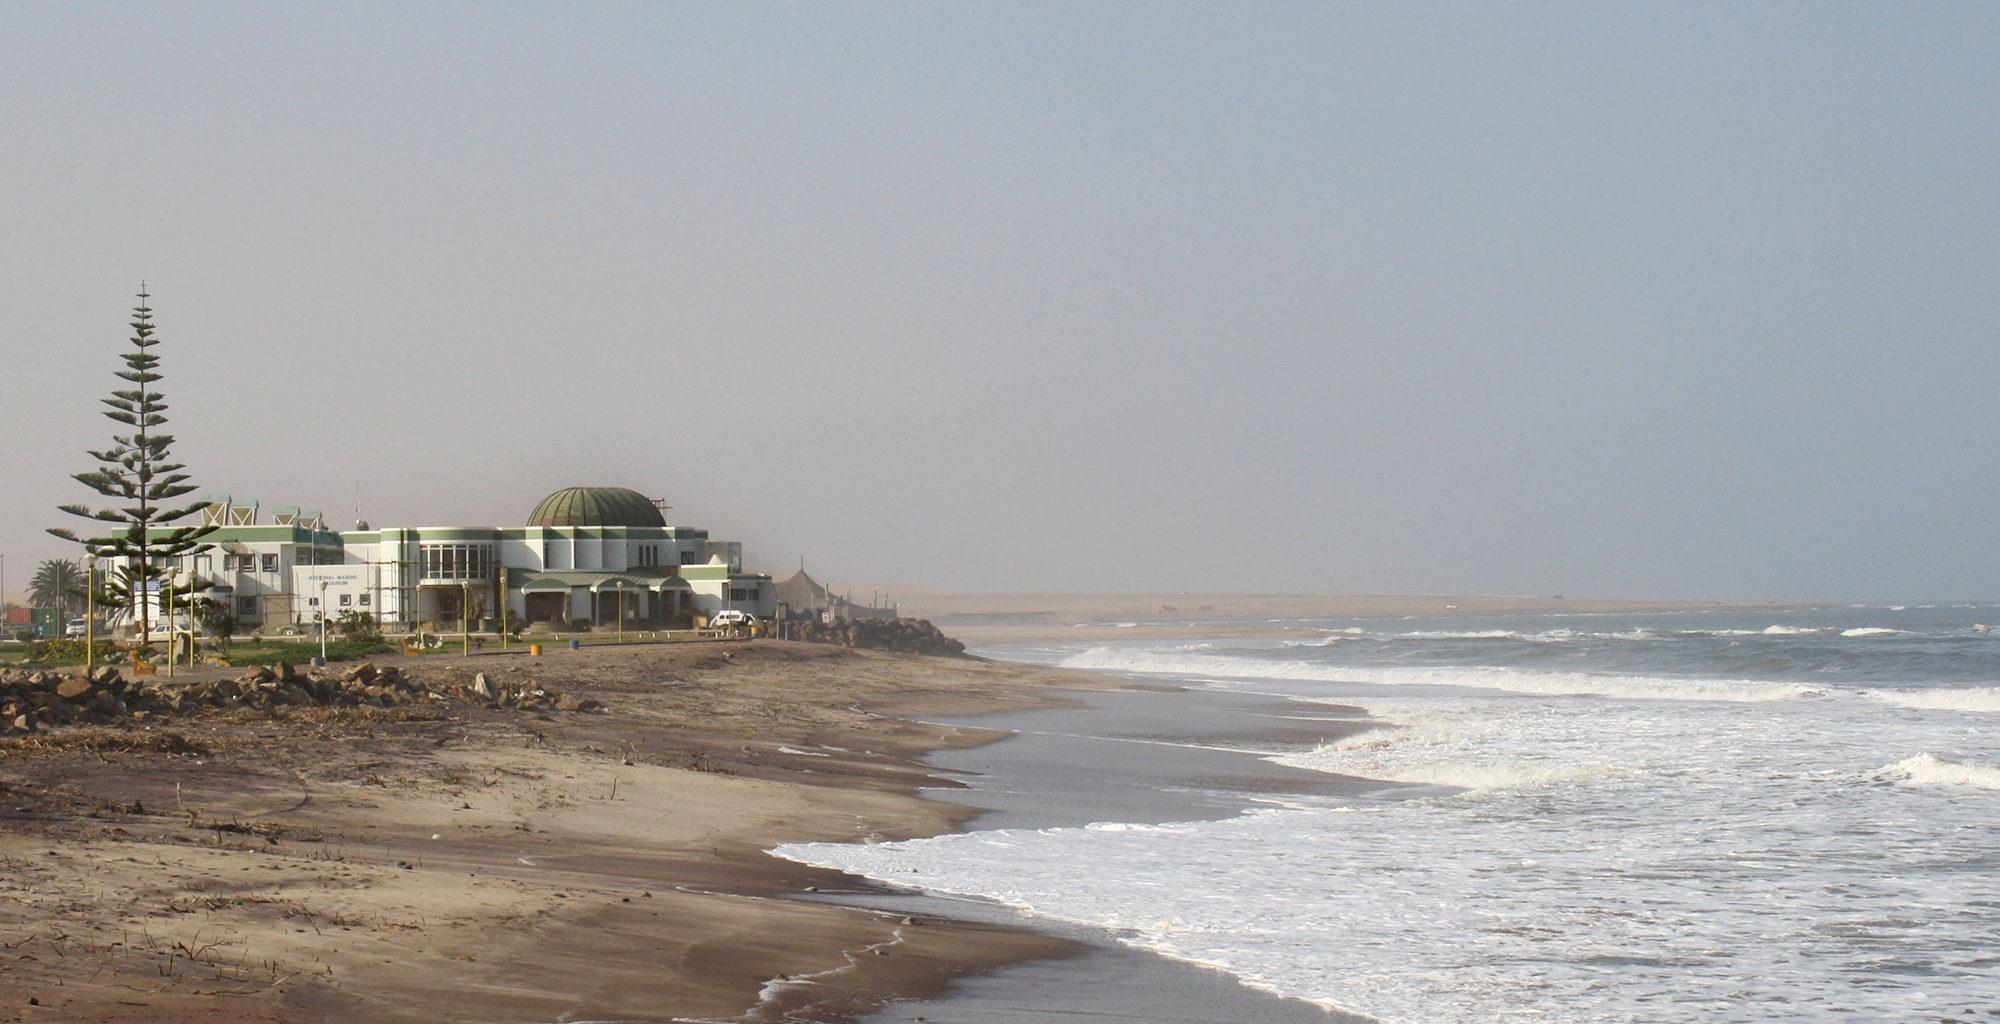 Namibia-Swakopmund-Coast